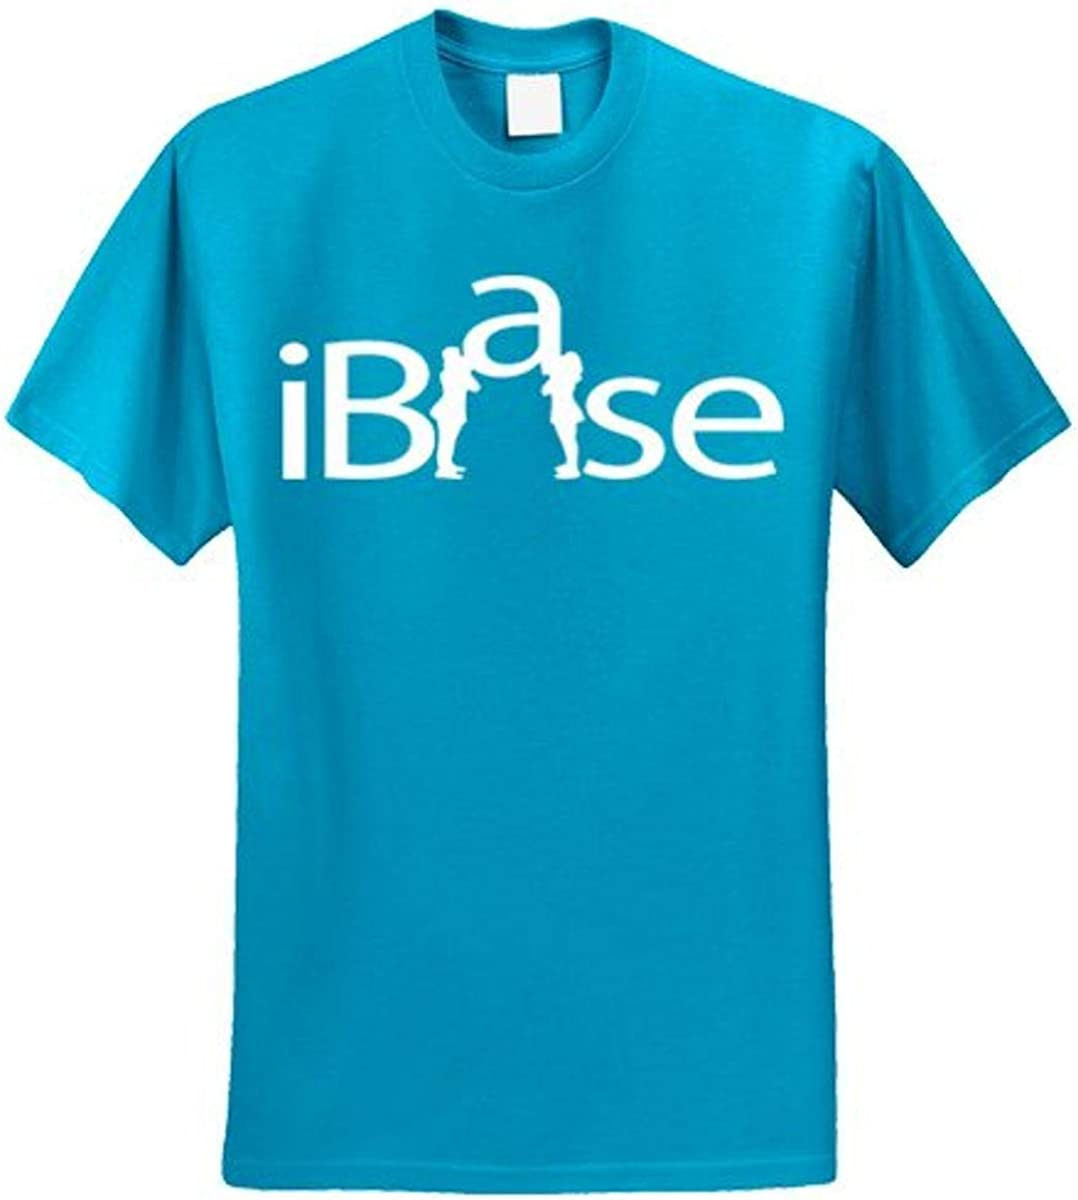 Chosen Bows Neon Blue iBase T-Shirt Adult Large White Print